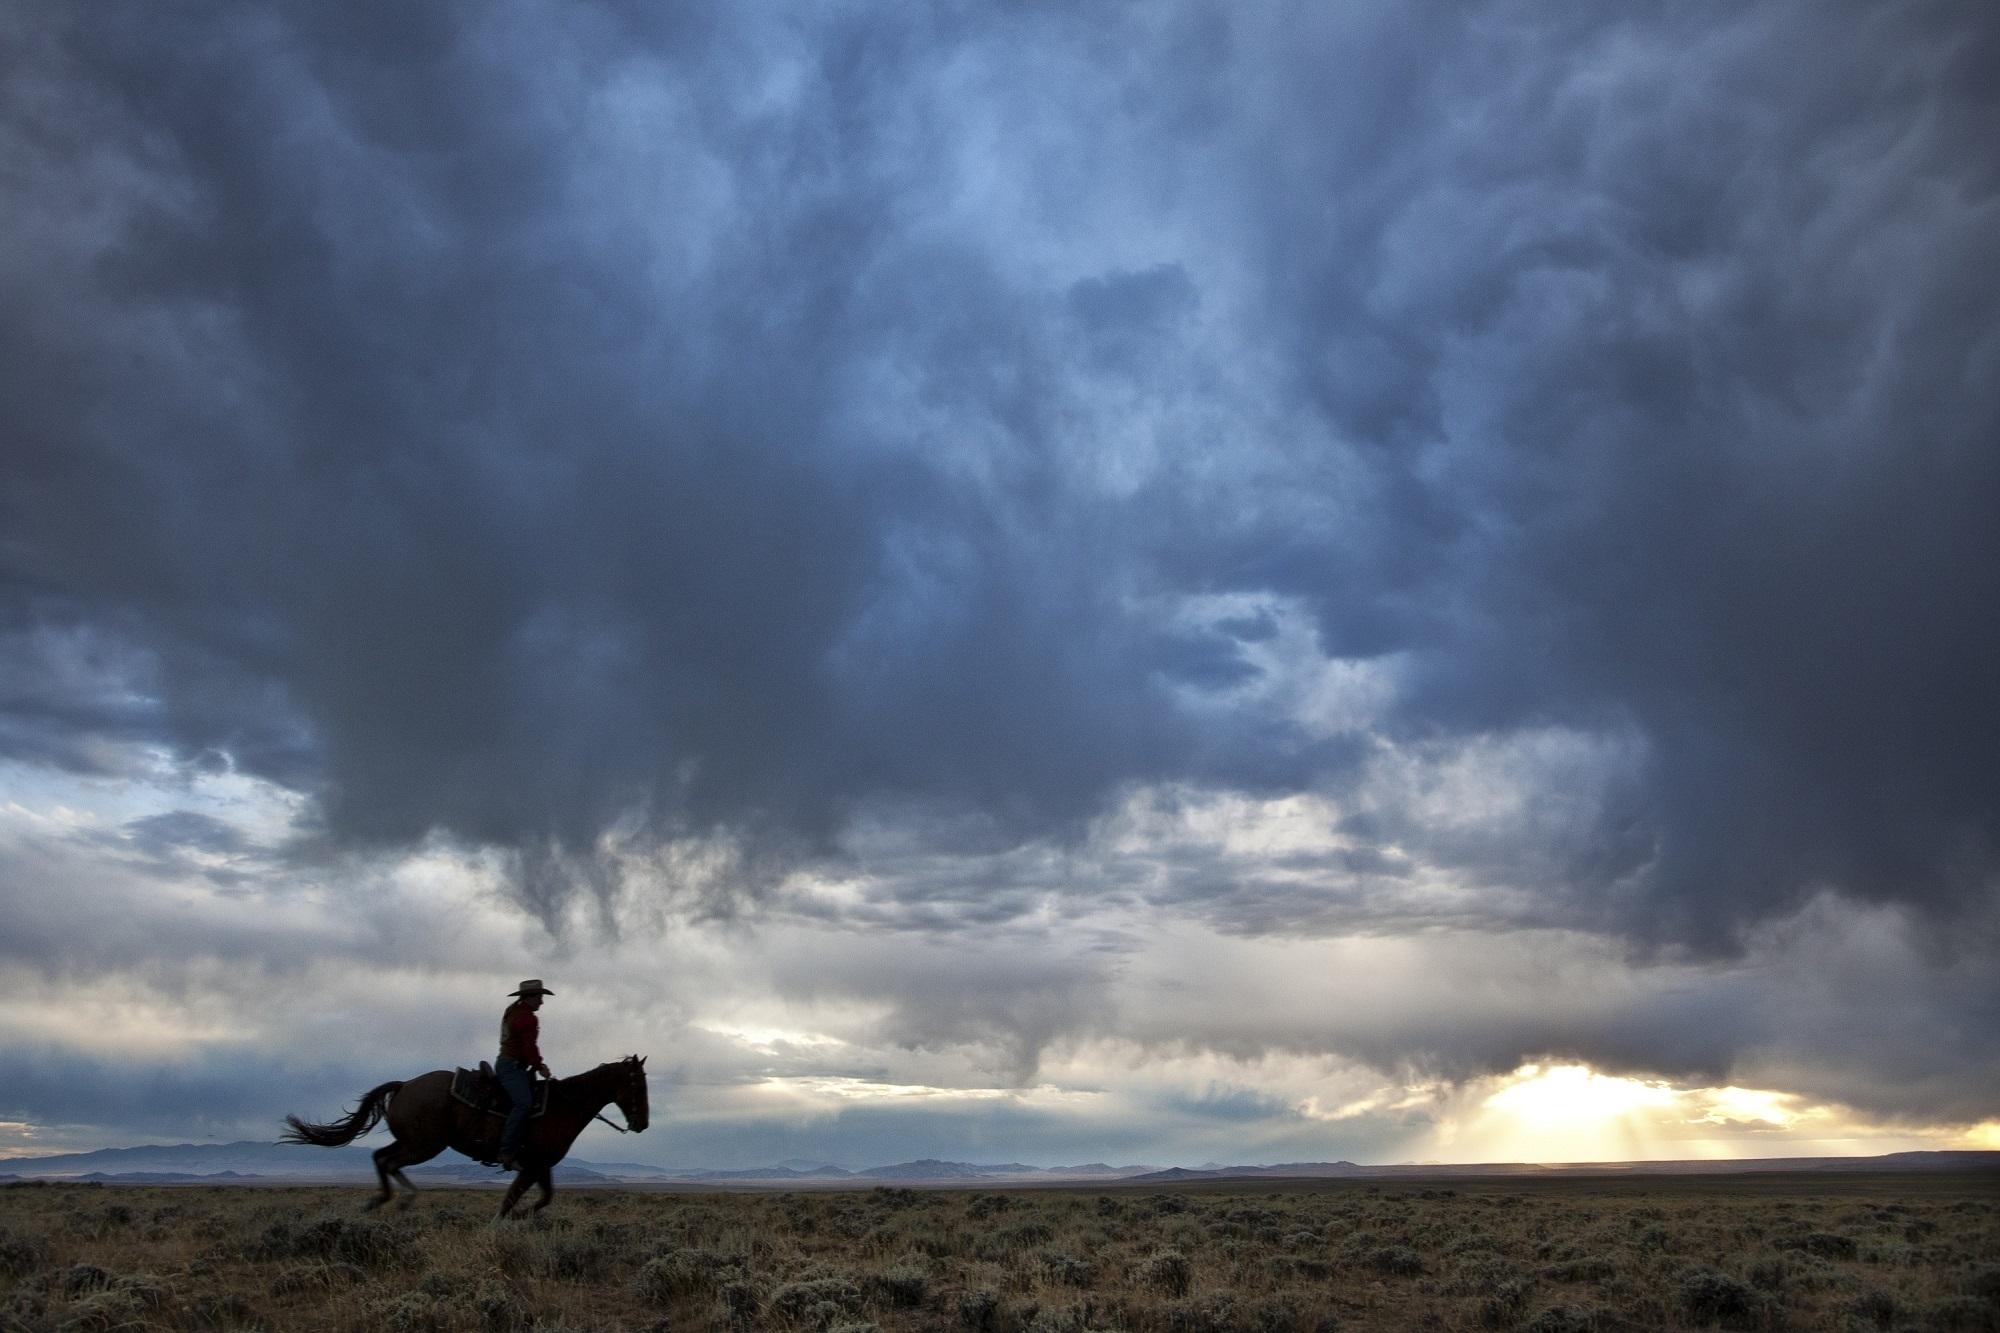 Cowboy: Sunset, Cloud, Landscape, Cowboy, Horse, Silhouette, Sky, Sunbeam, Sunlight, Dusk, Panorama